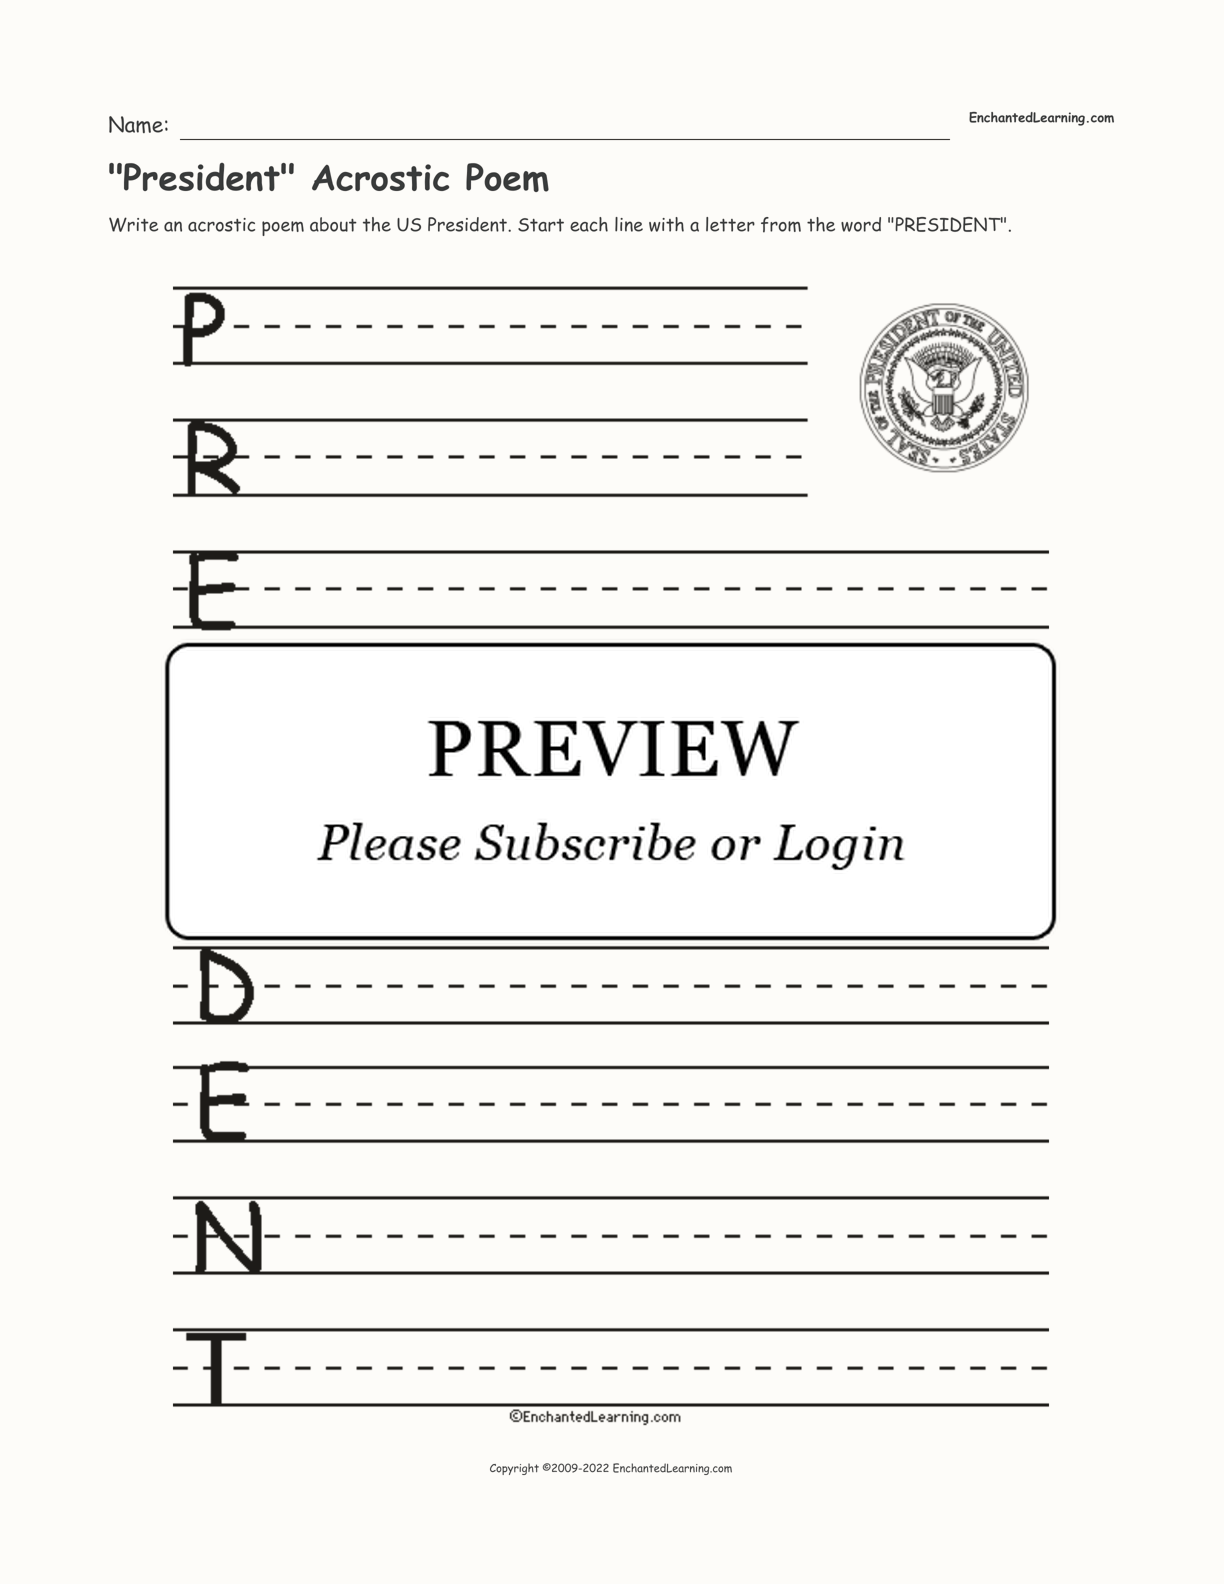 President Acrostic Poem